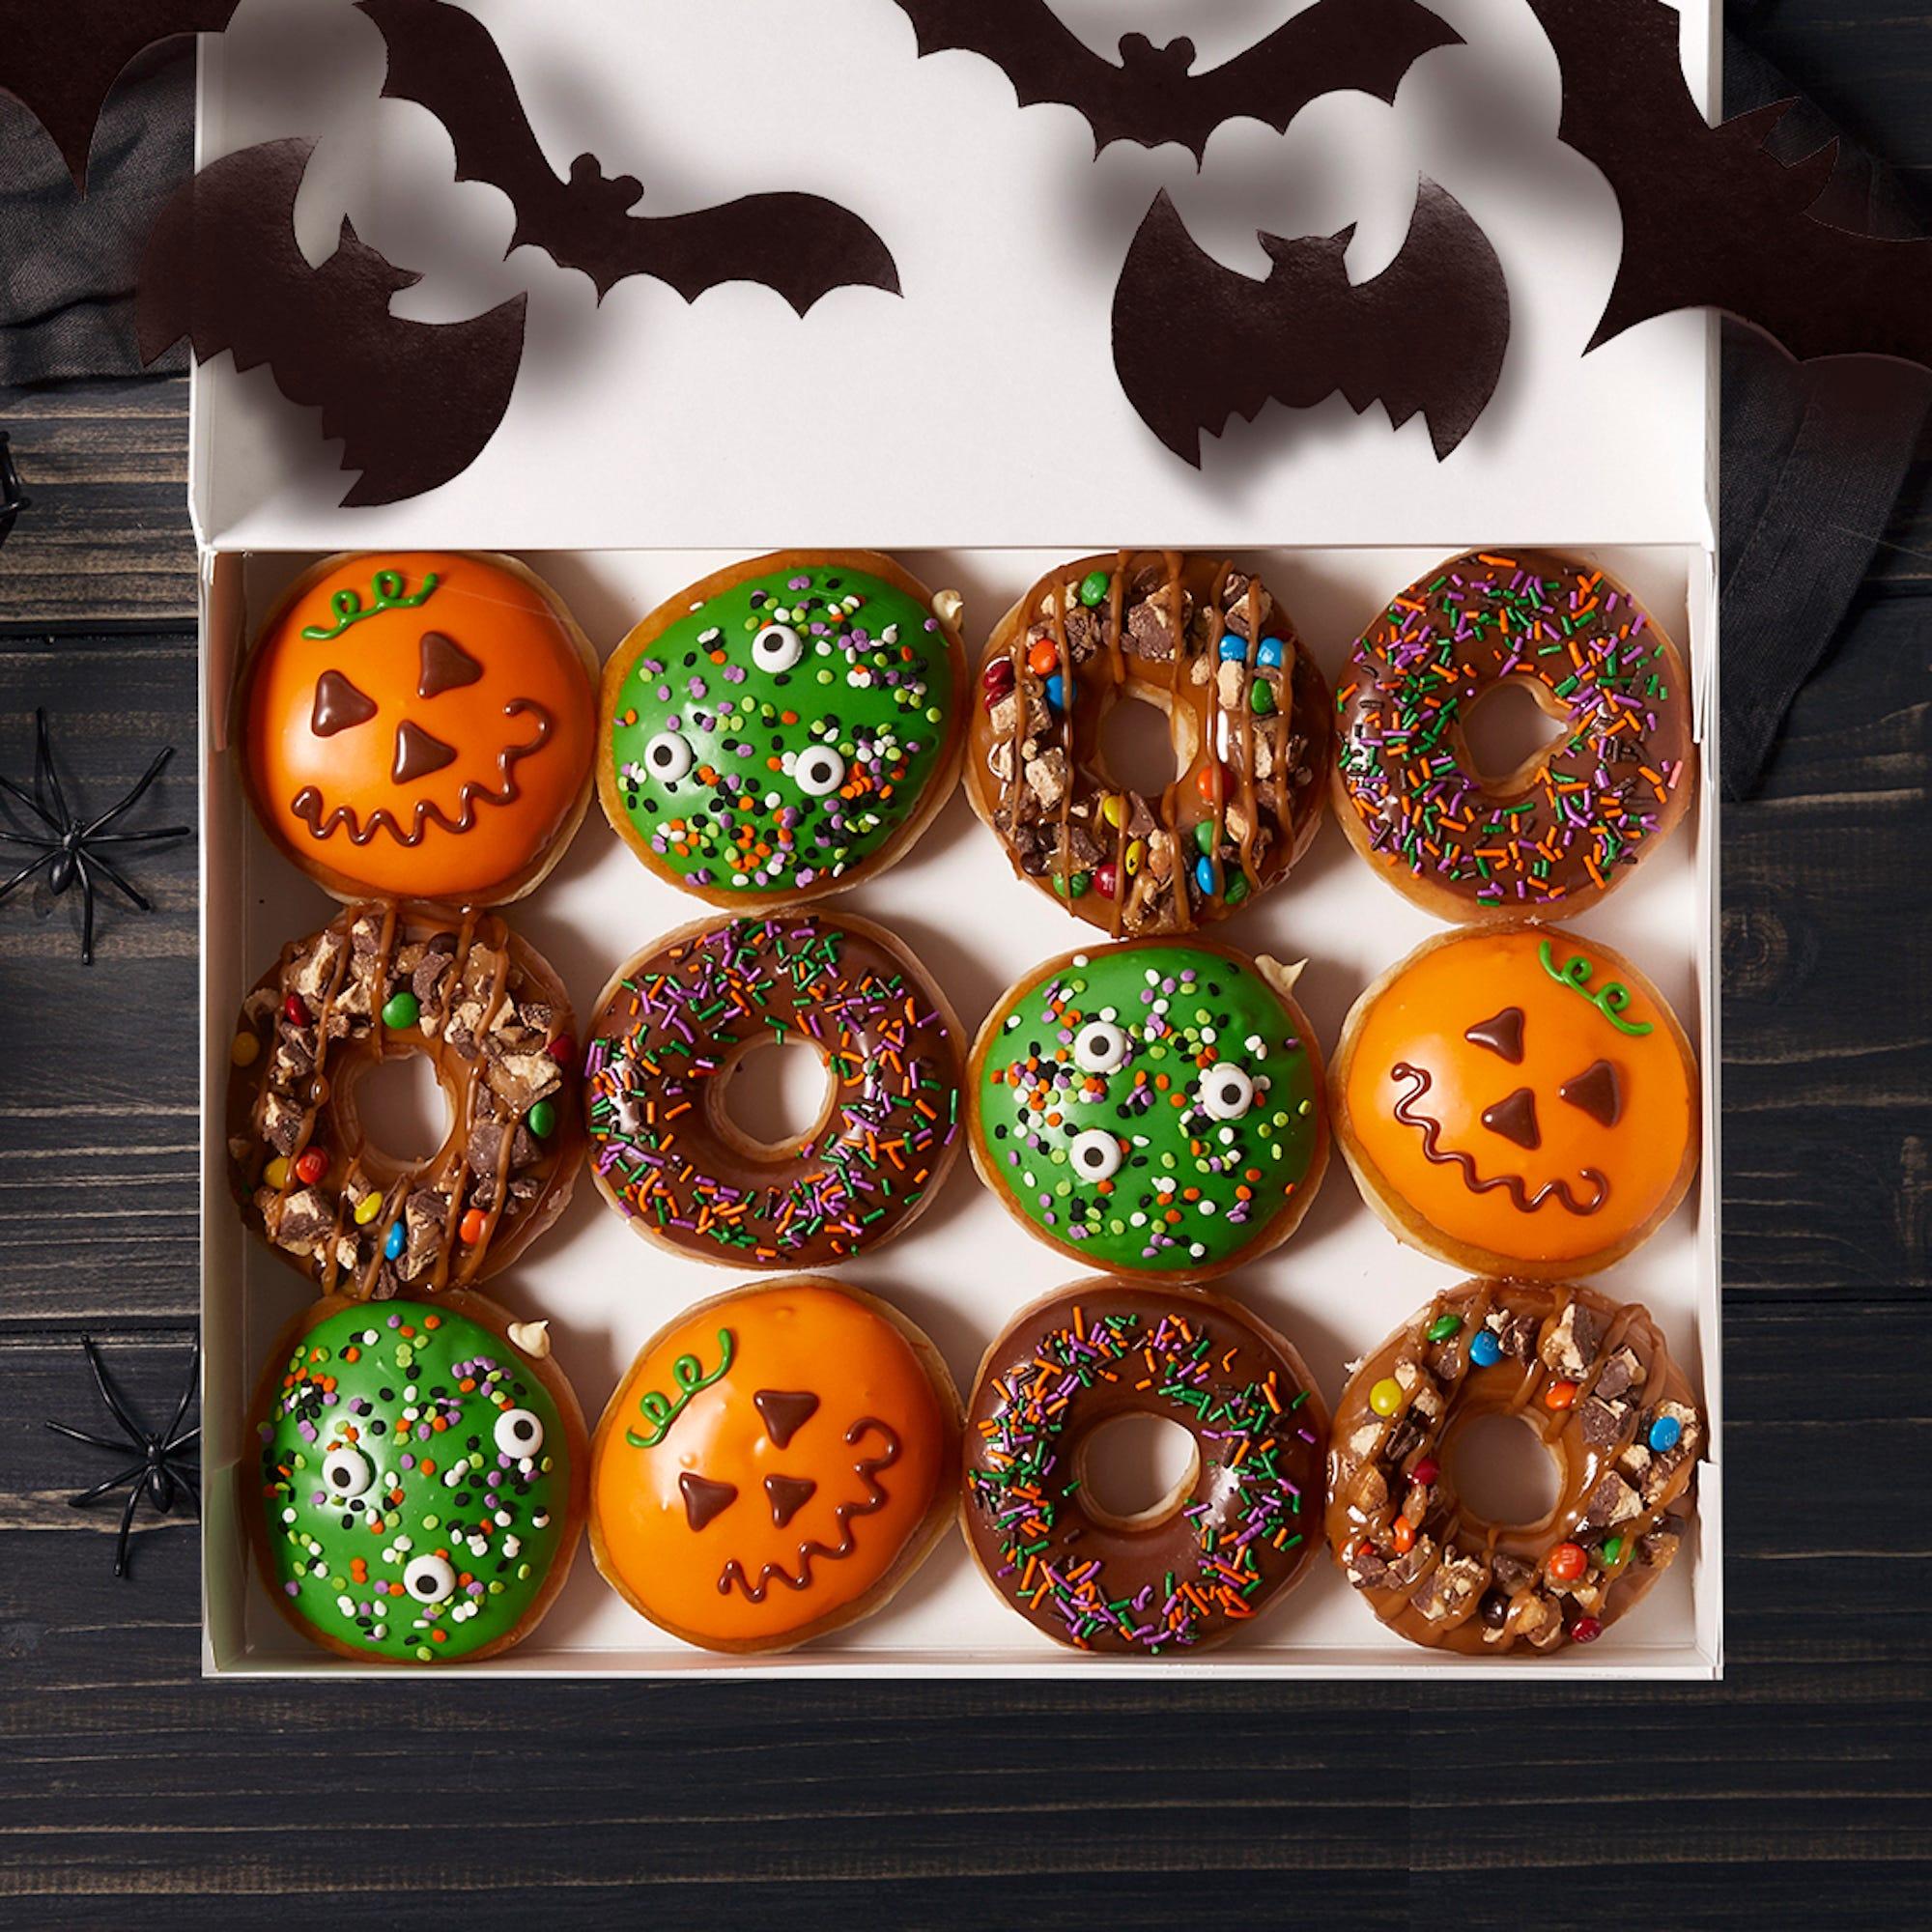 halloween deals 2018: specials, free food & freebies